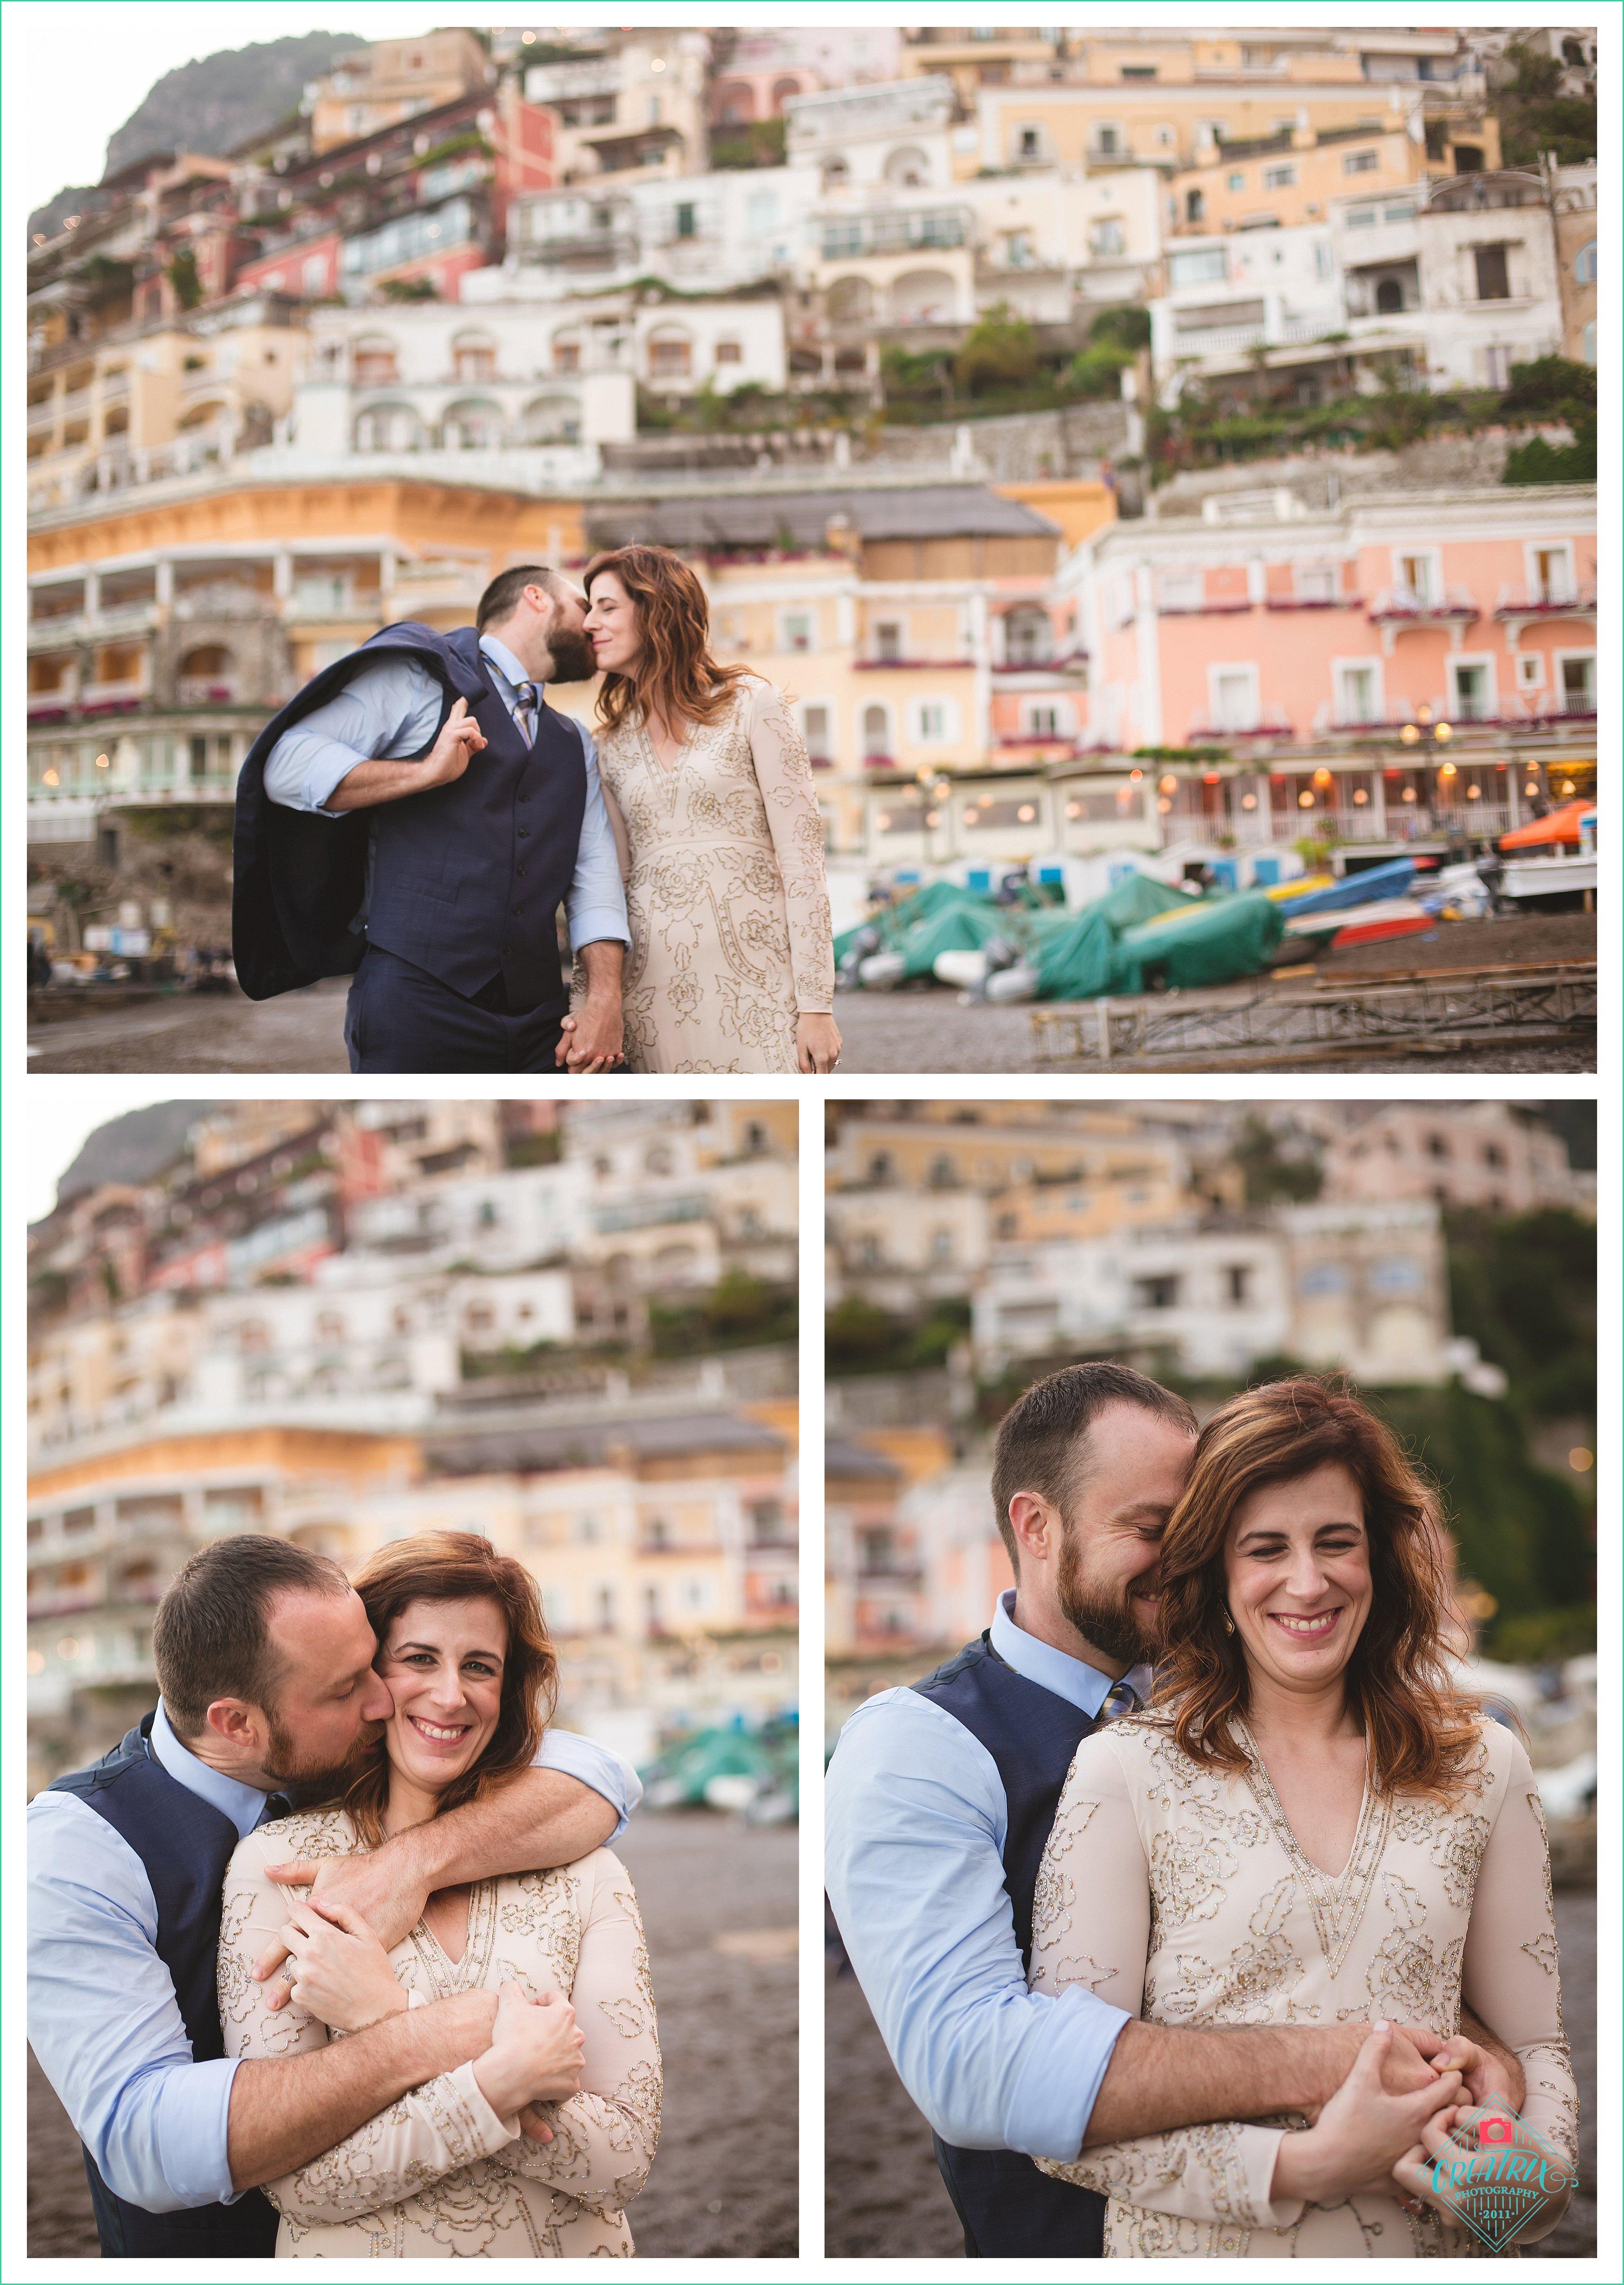 Italy Elopement Photographer